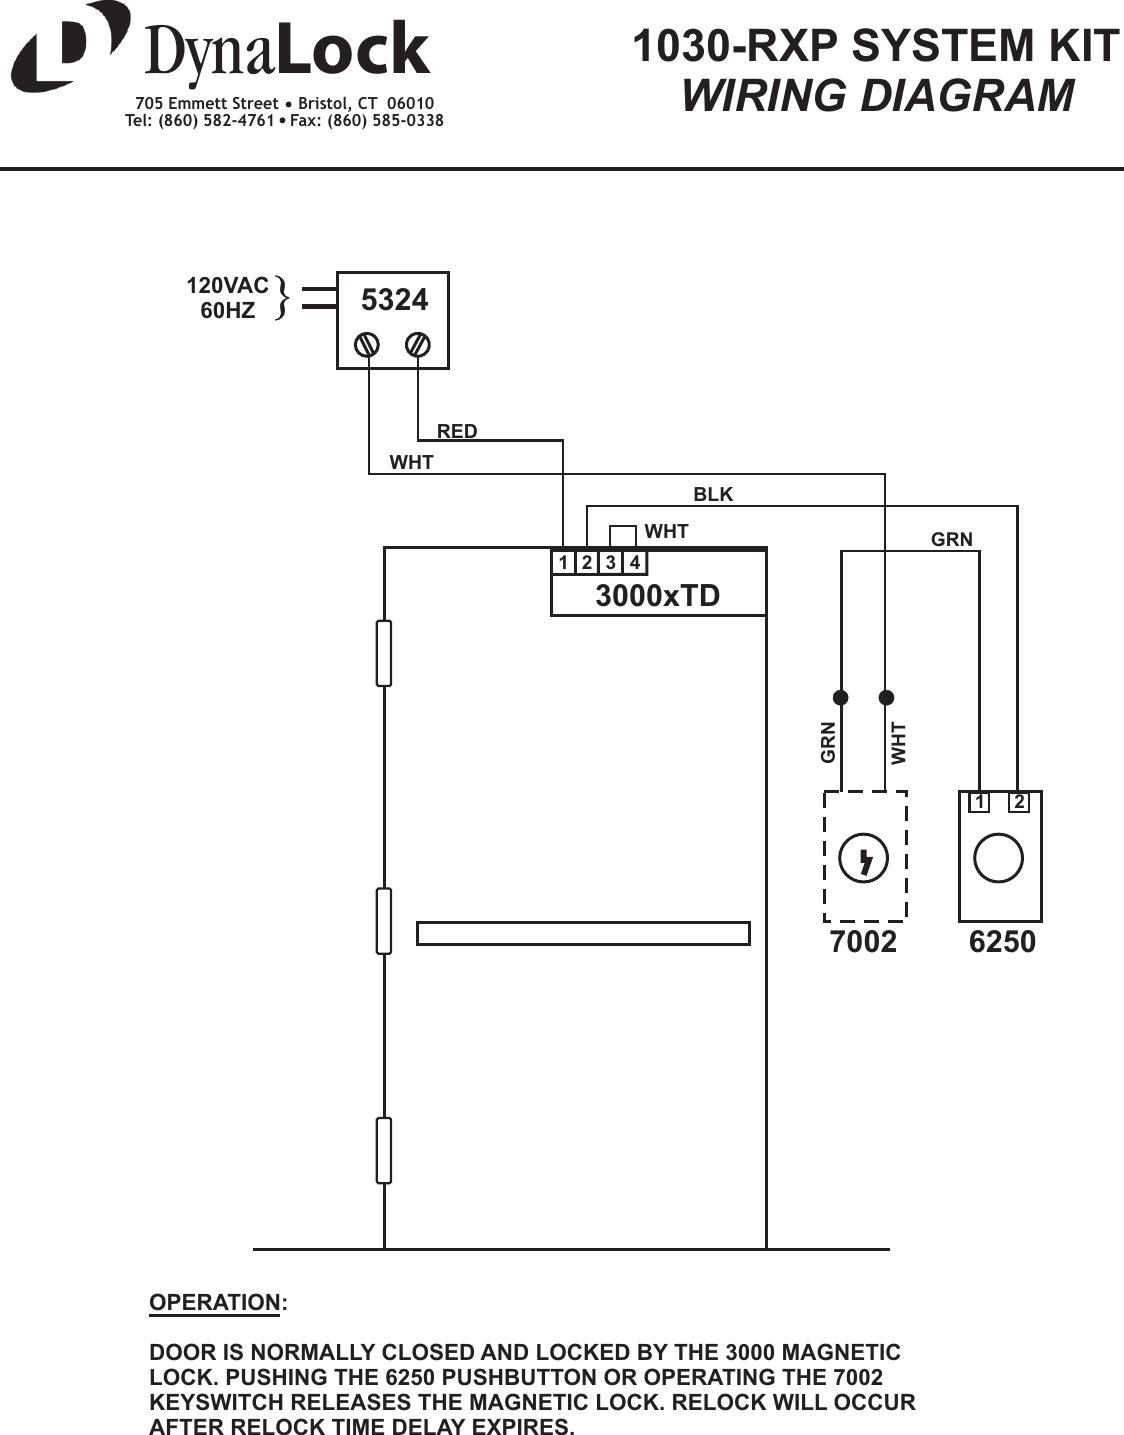 Dynalock Push Button Wiring Diagram Diagrams Locknetics Maglock 1030rxpwd 1030 Rxp System Kit 1030rxp Schematic